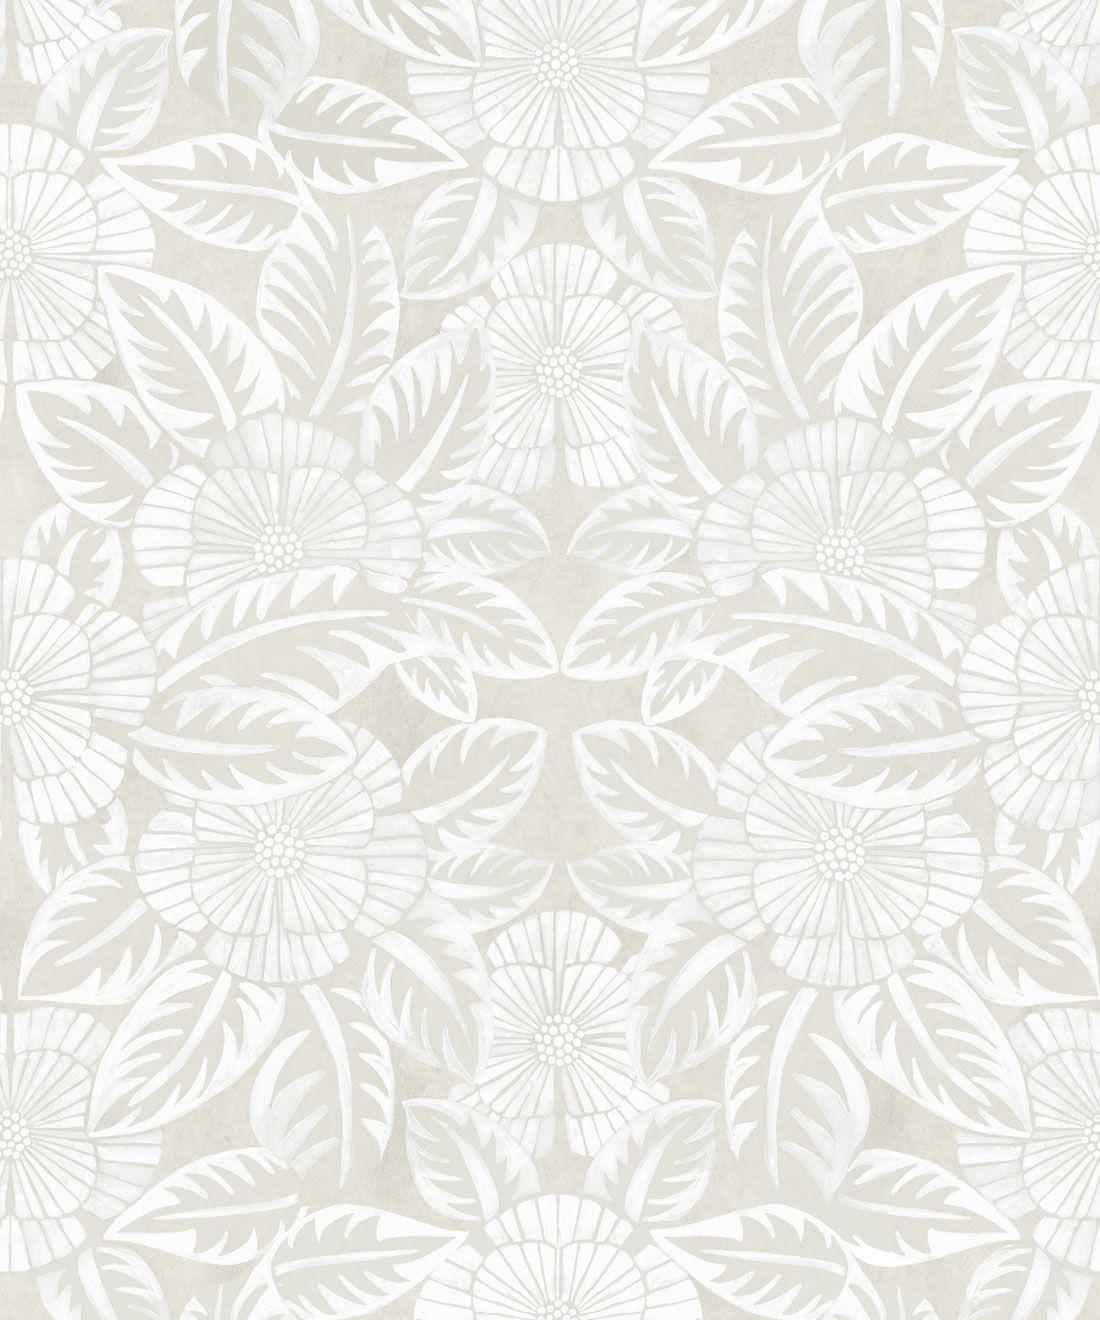 Calcutta Wallpaper • Flower and Leaf Motif Design • Ethnic Wallpaper • Beige Wallpaper • Swatch